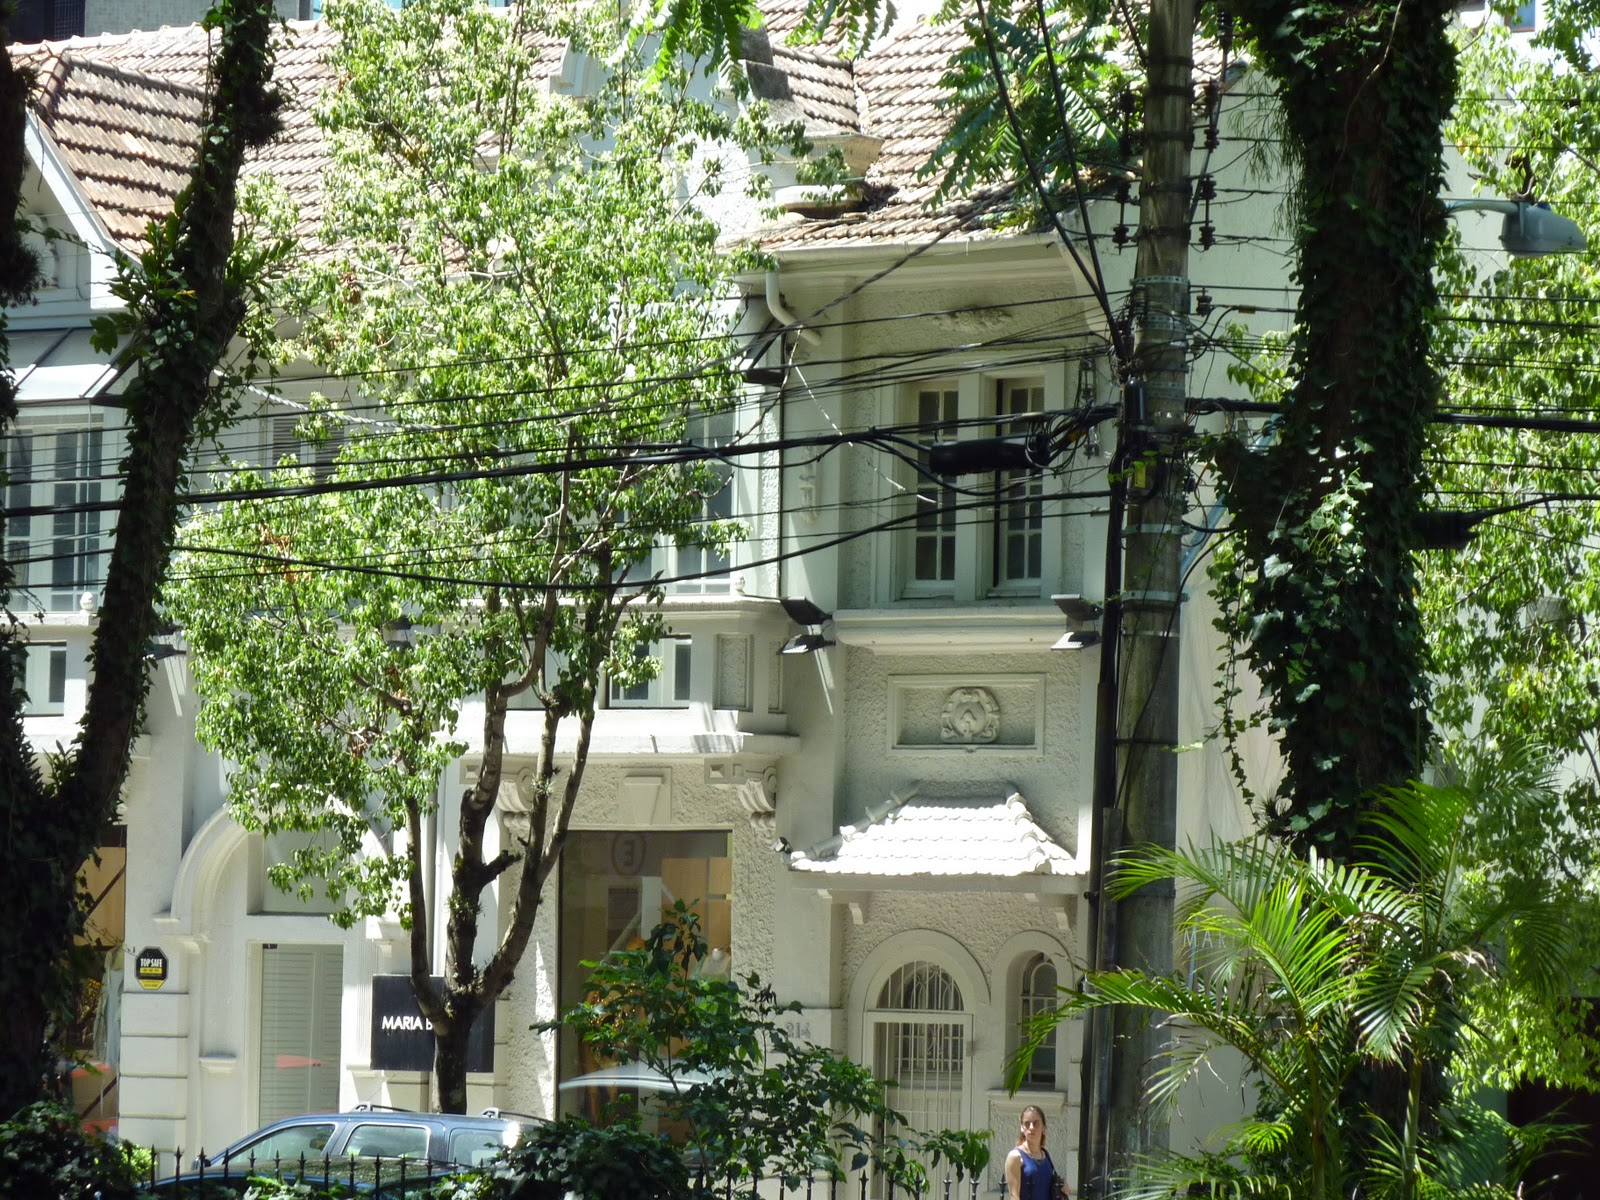 Global paths: Rua Padre Chagas, Porto Alegre (RS)